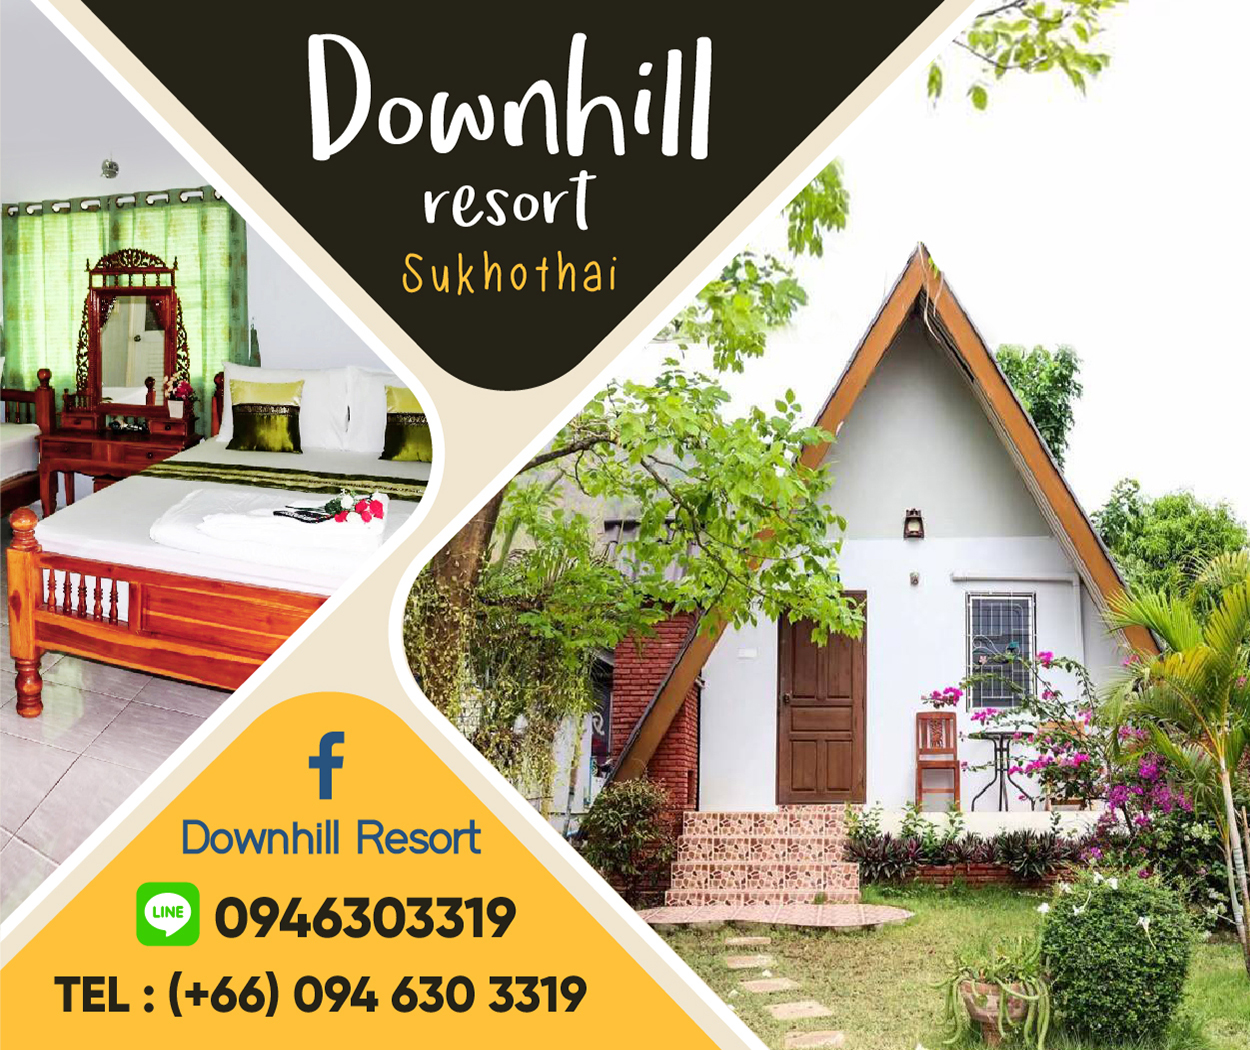 Downhill Resort